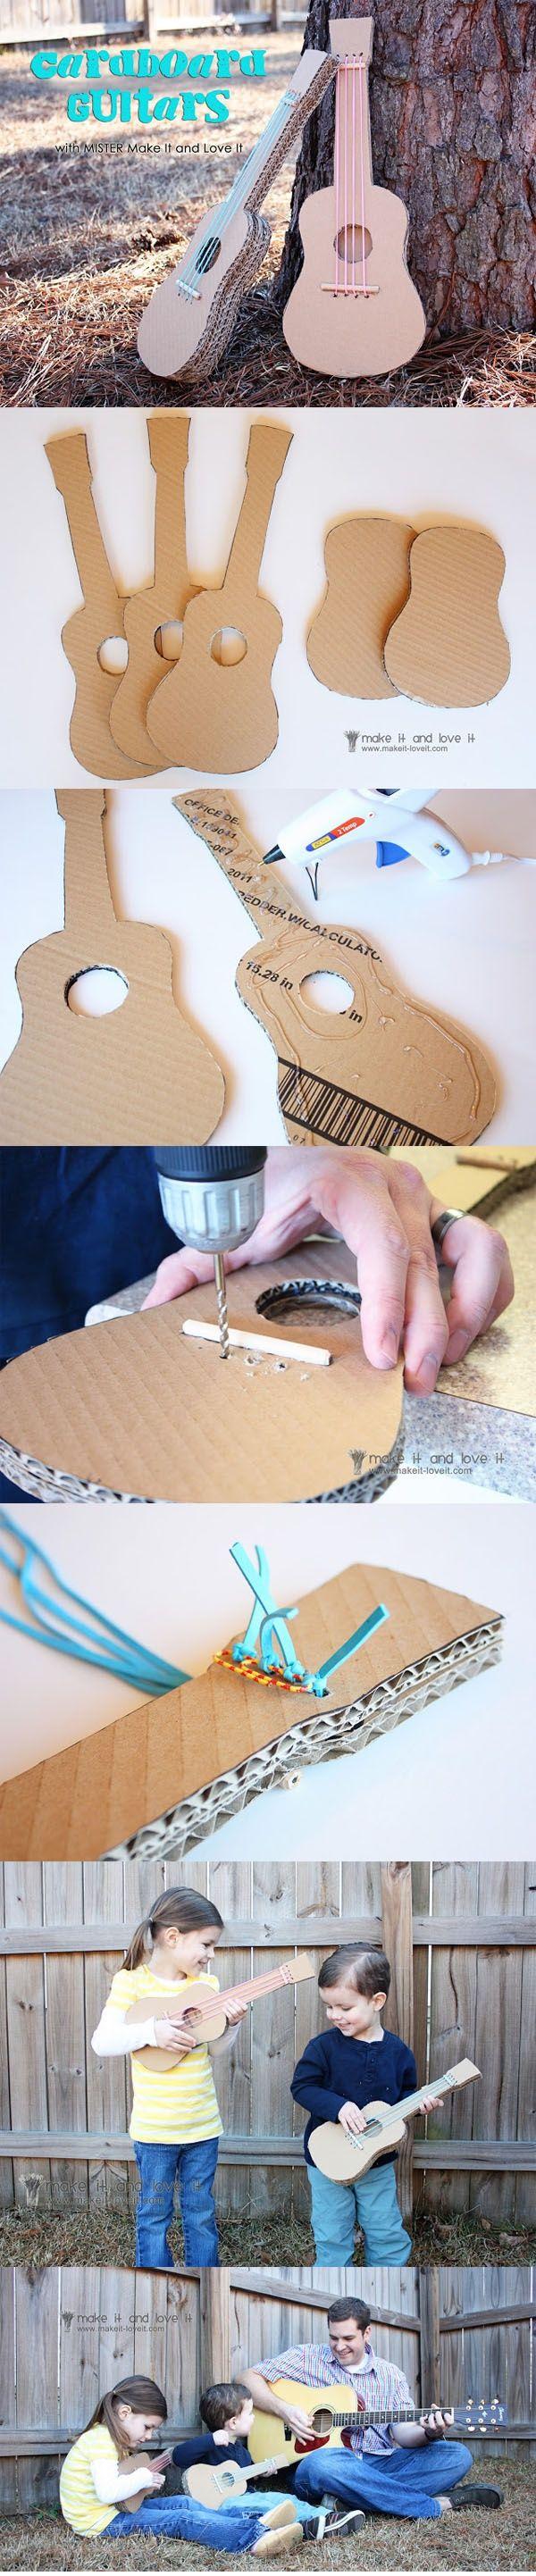 DIY: Cardboard guitar